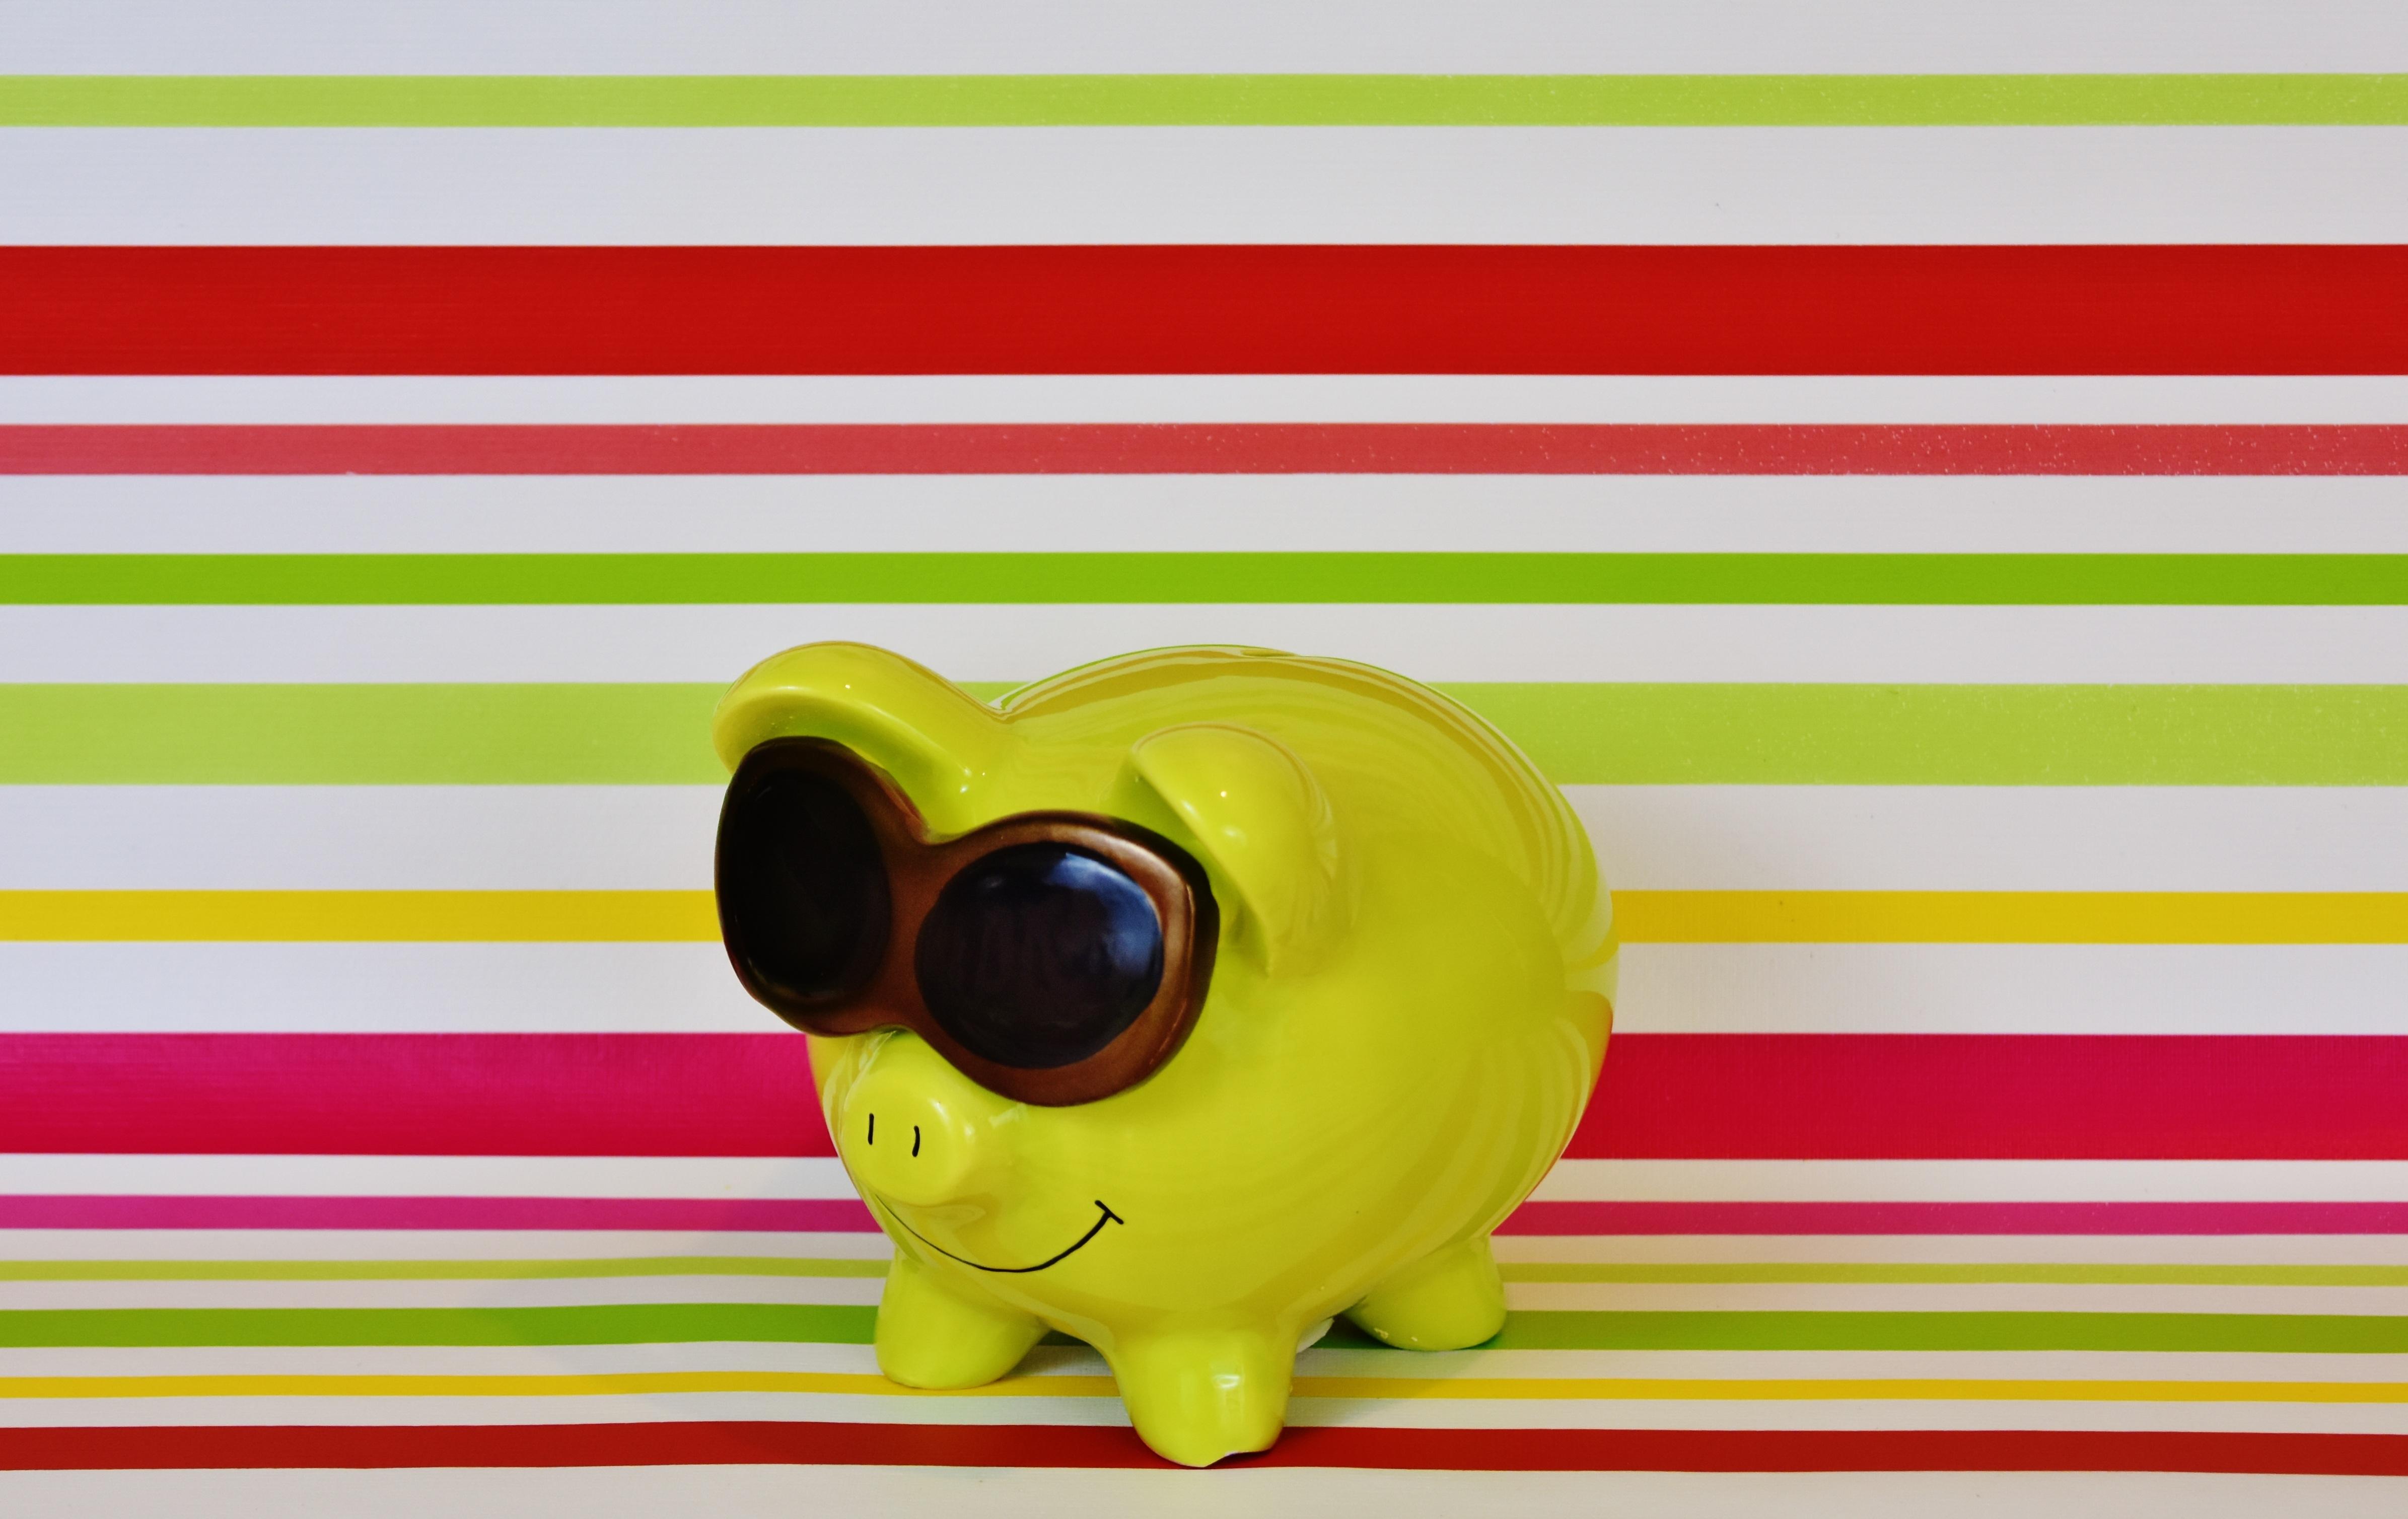 Gambar Hijau Warna Kuning Mainan Fon Ilustrasi Keren Lucu